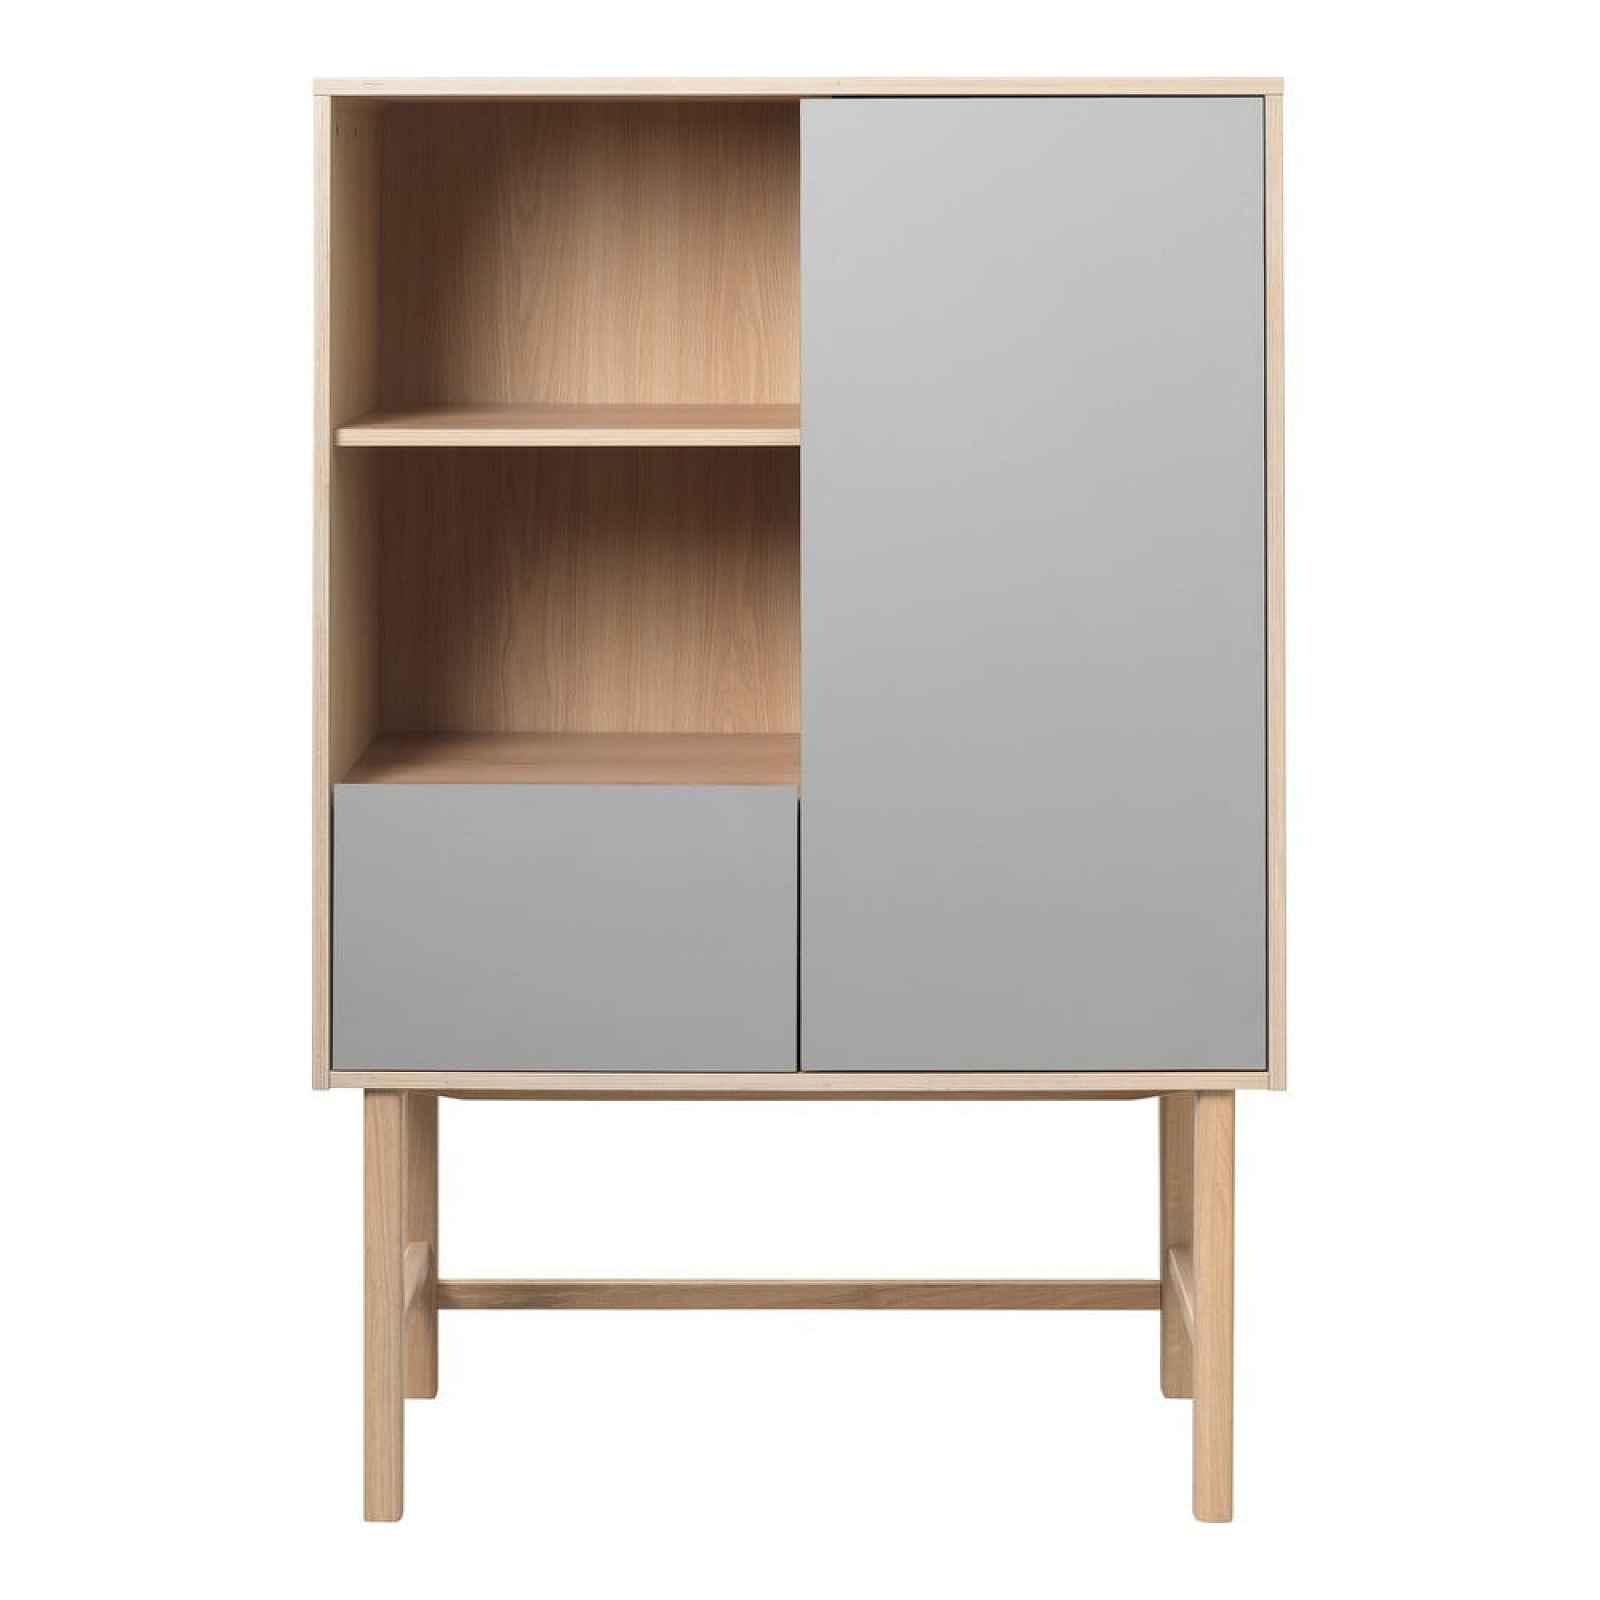 Šedá komoda s nohami z dubového dřeva Unique Furniture Bilbao